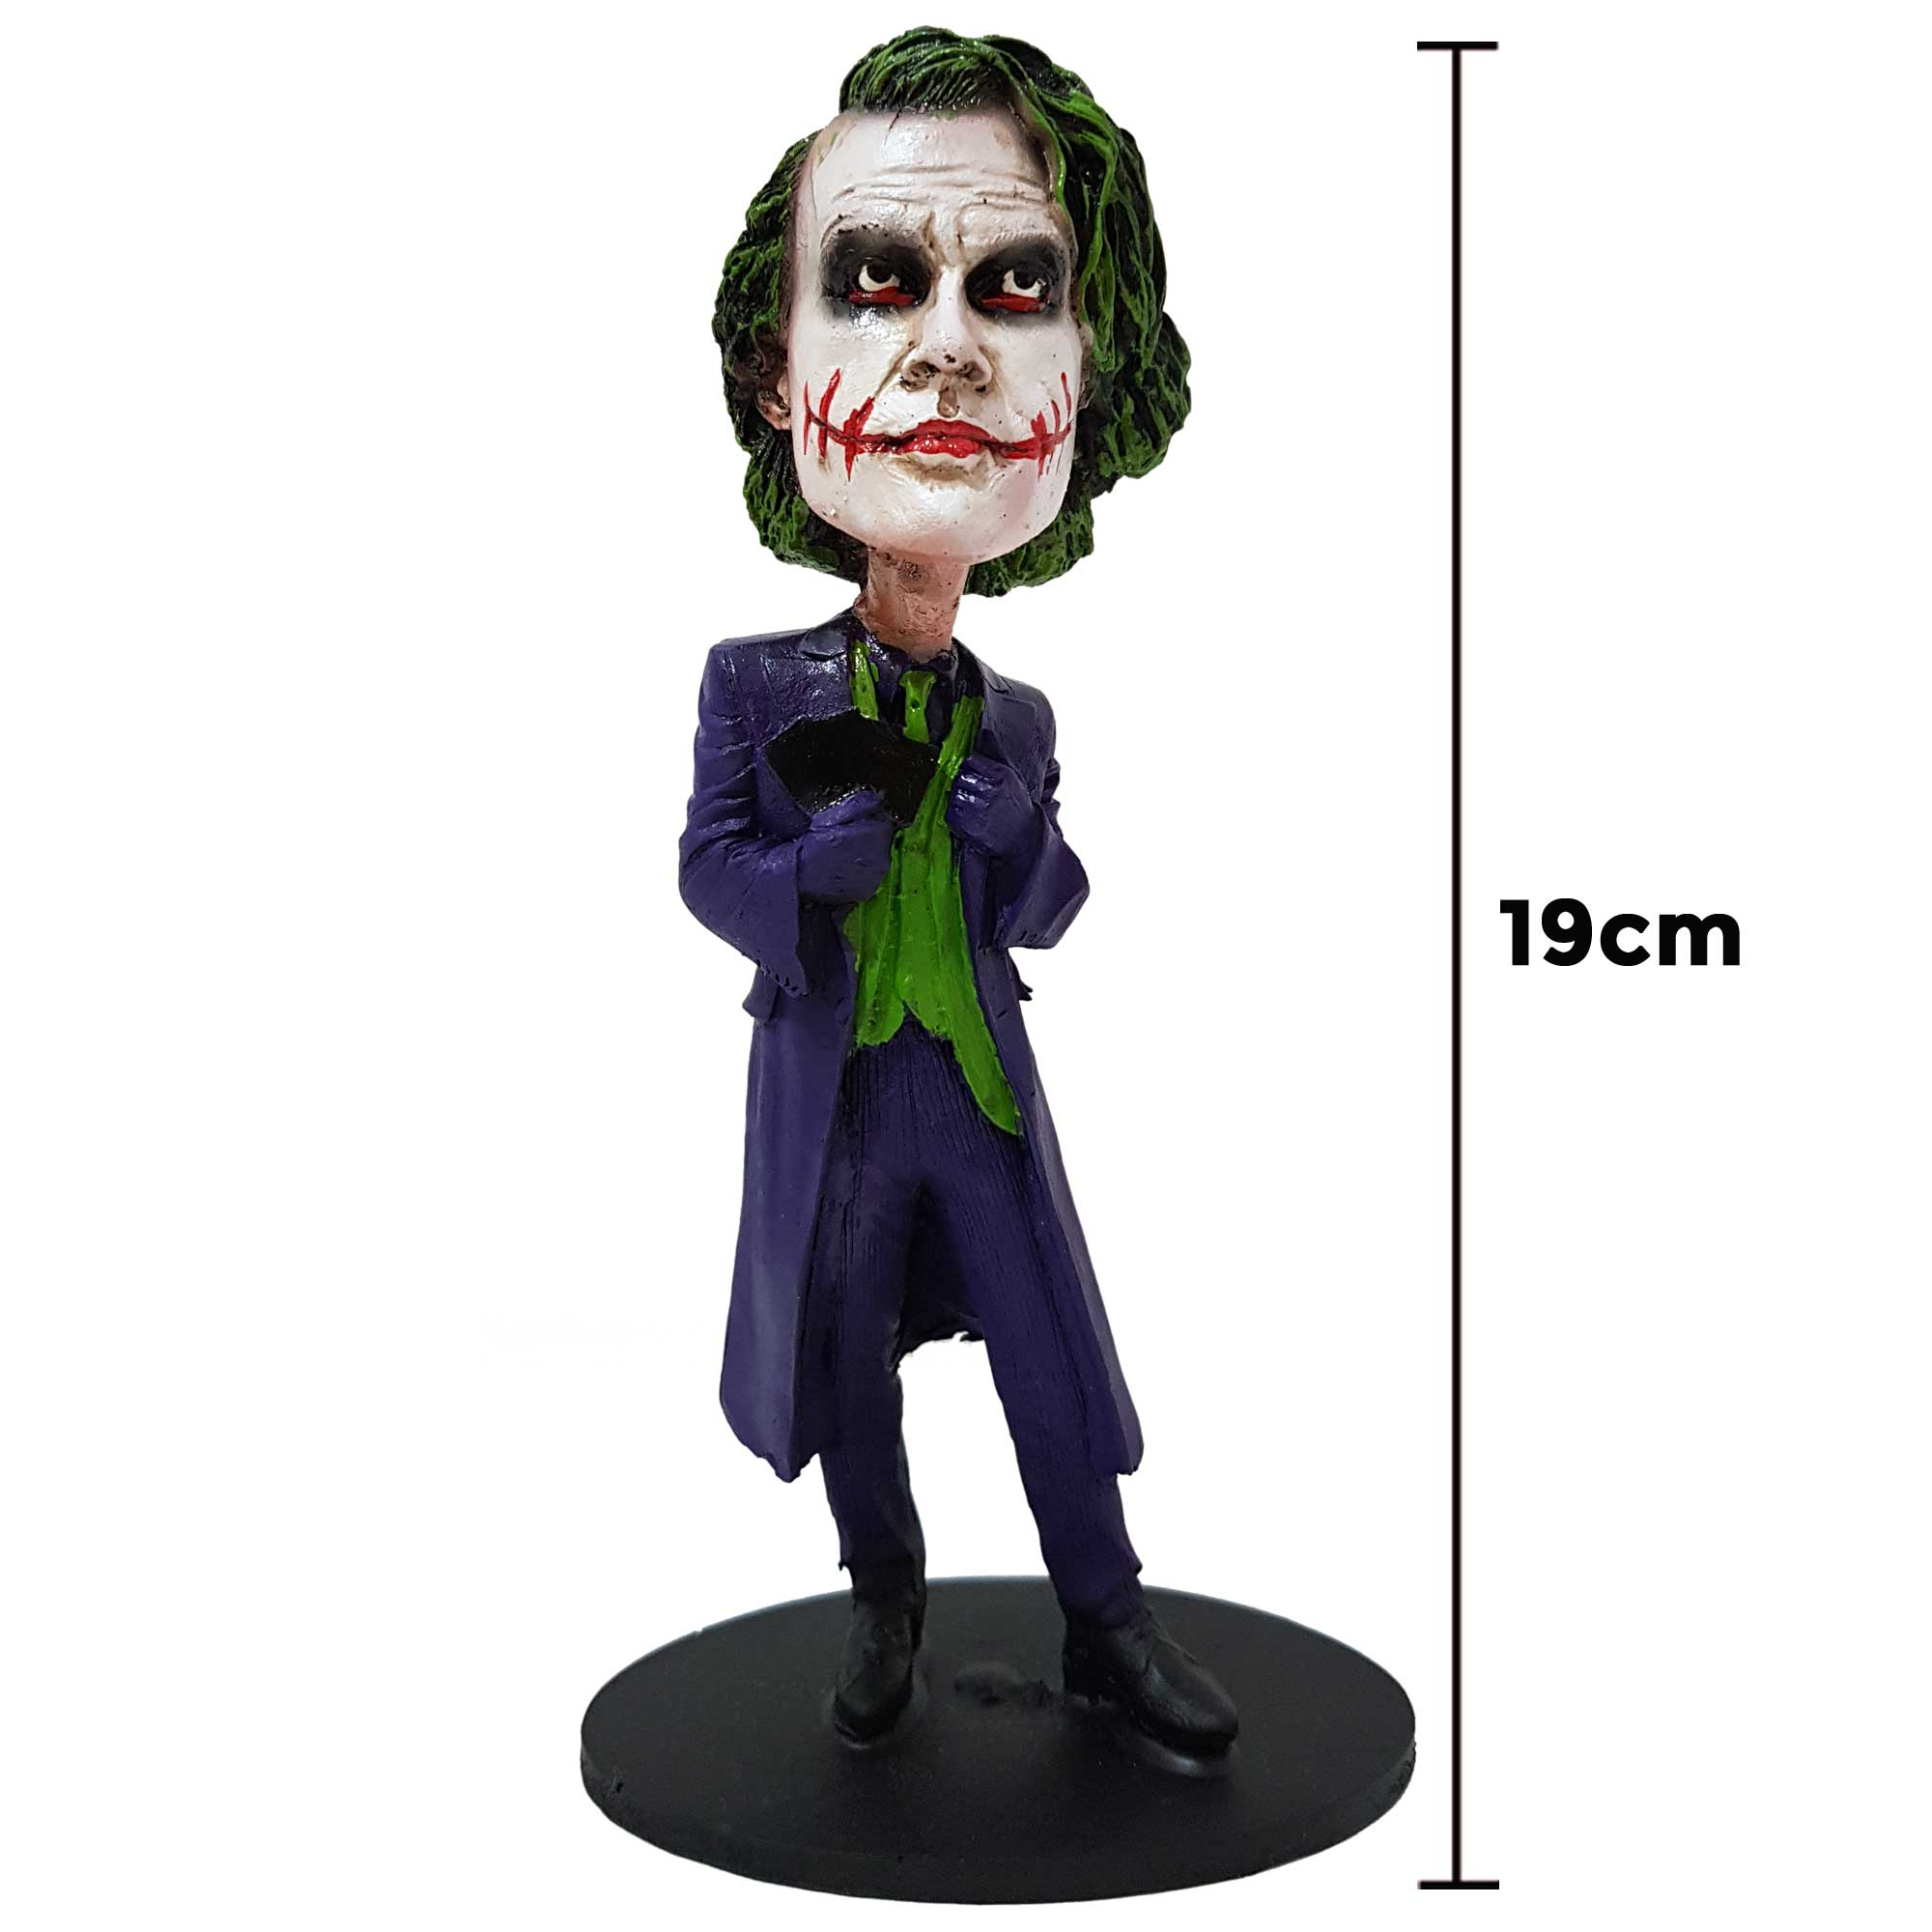 Boneco Coringa Heath Ledger Action Figure Bobble Head 19cm